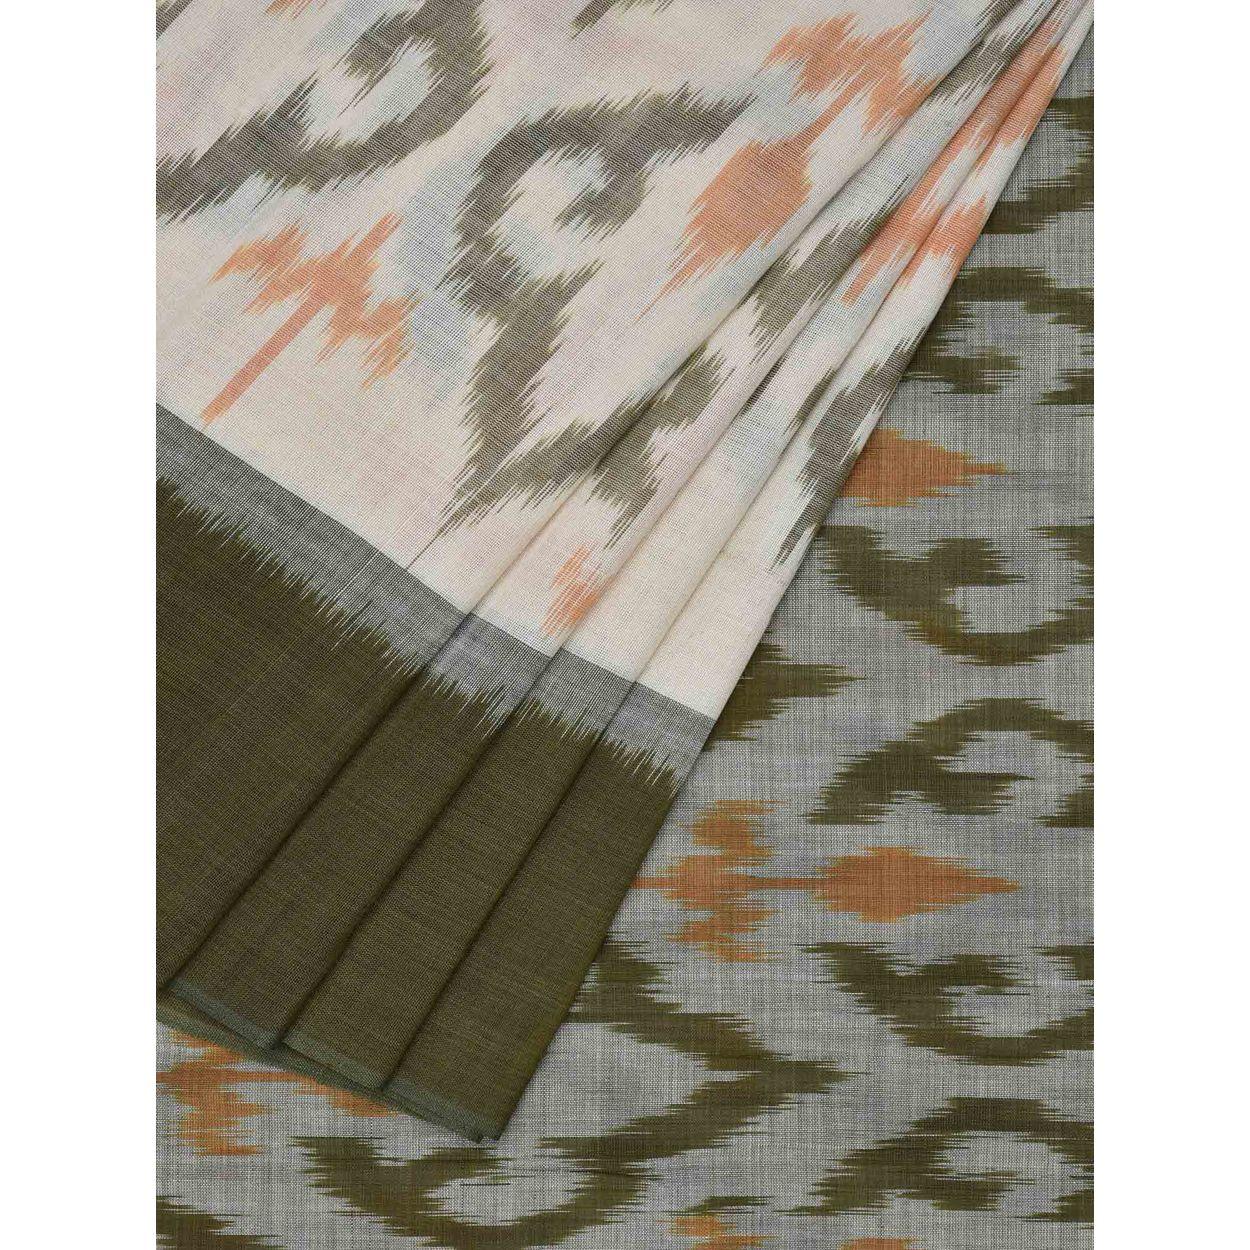 c3d88c8823ac08 Green and White Color Sari   Pochampally Ikat Cotton Handloom Saree ...